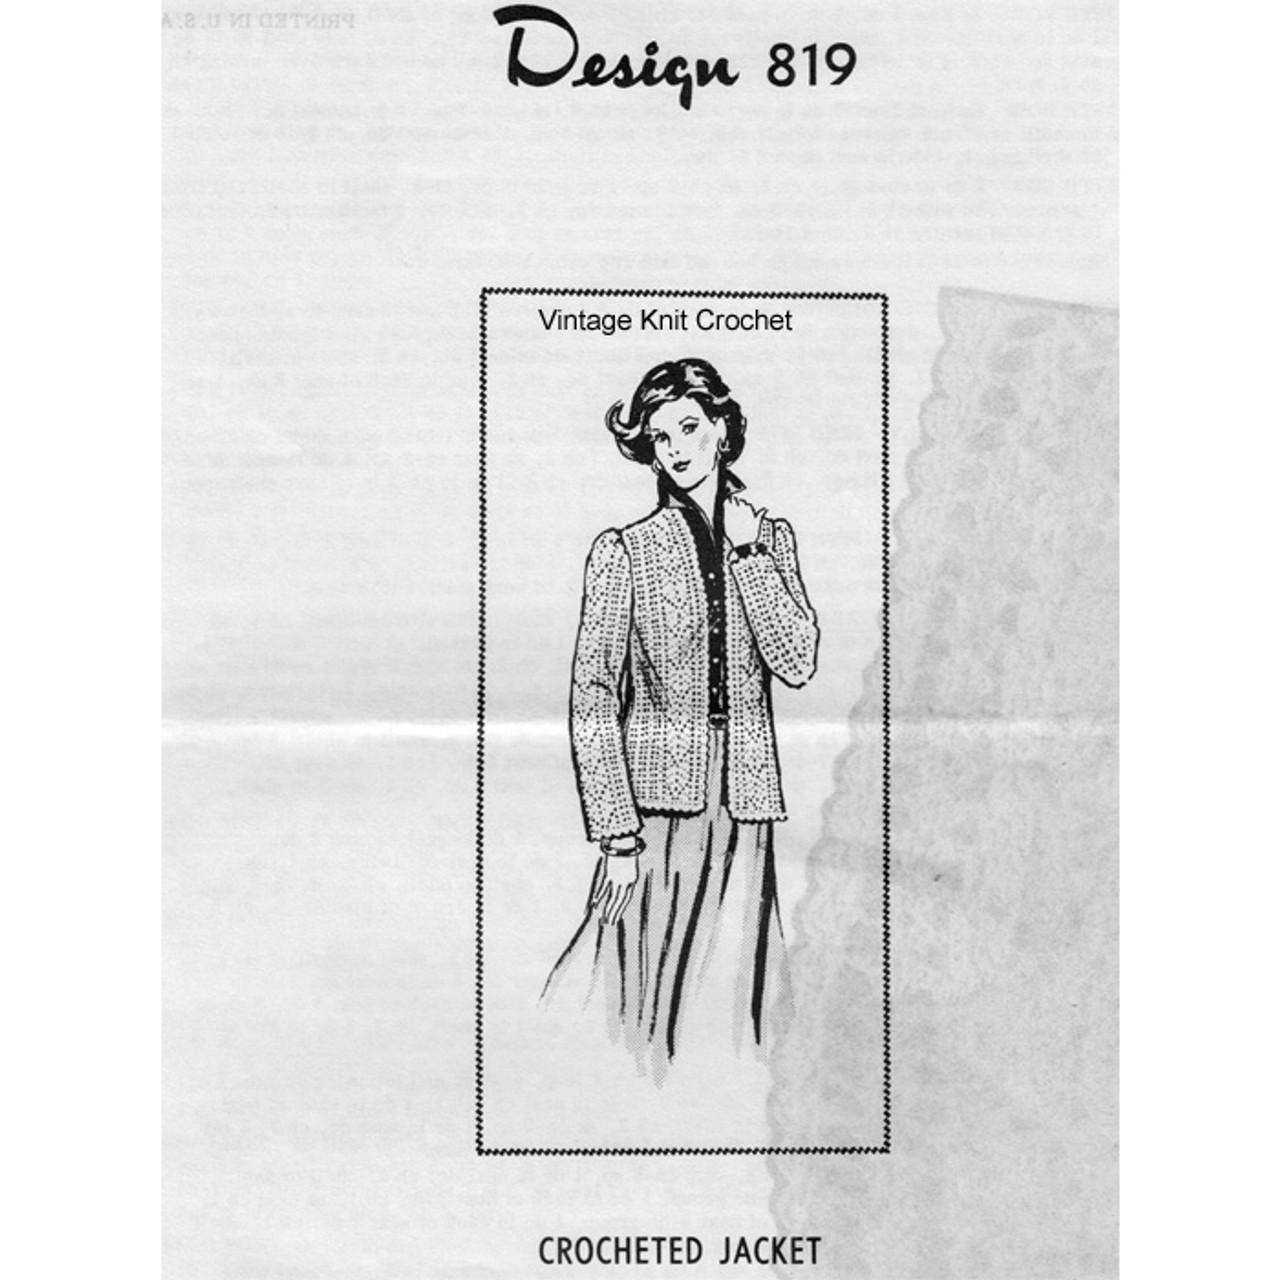 Crochet Pineapple Jacket Pattern Design 819